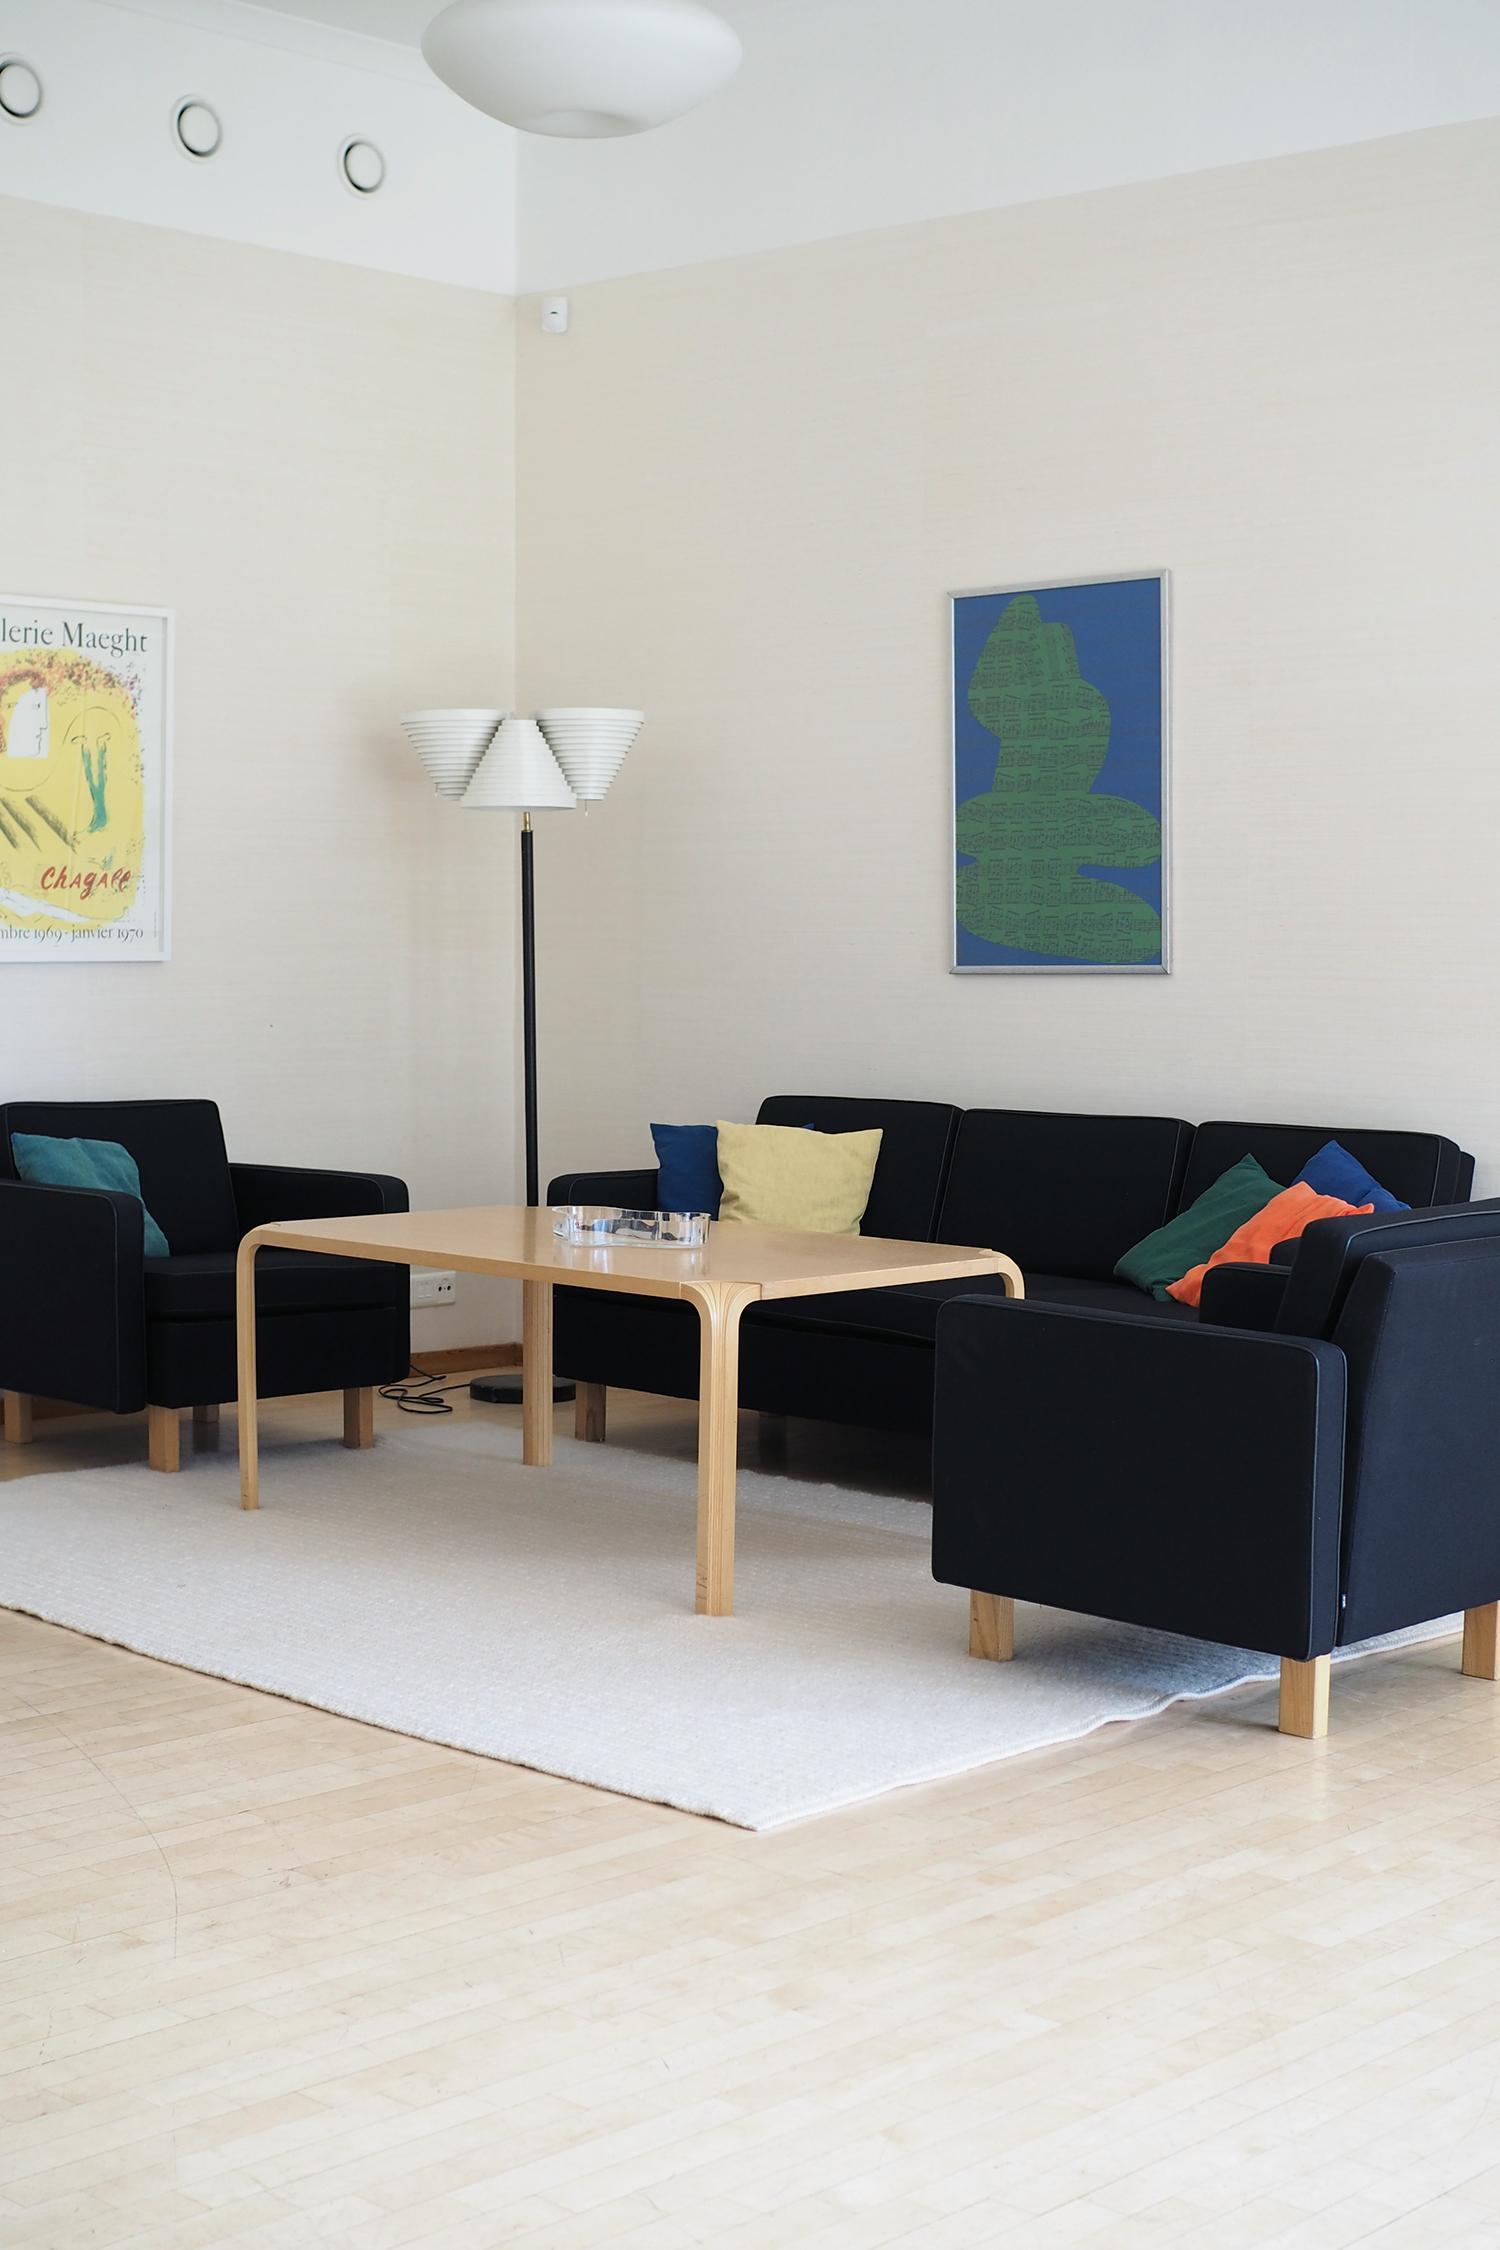 Char and the city, charandthecity.com, Alvar Aalto, Vierastalo Vainiola, Ahlströmin ruukki, Noormarkku